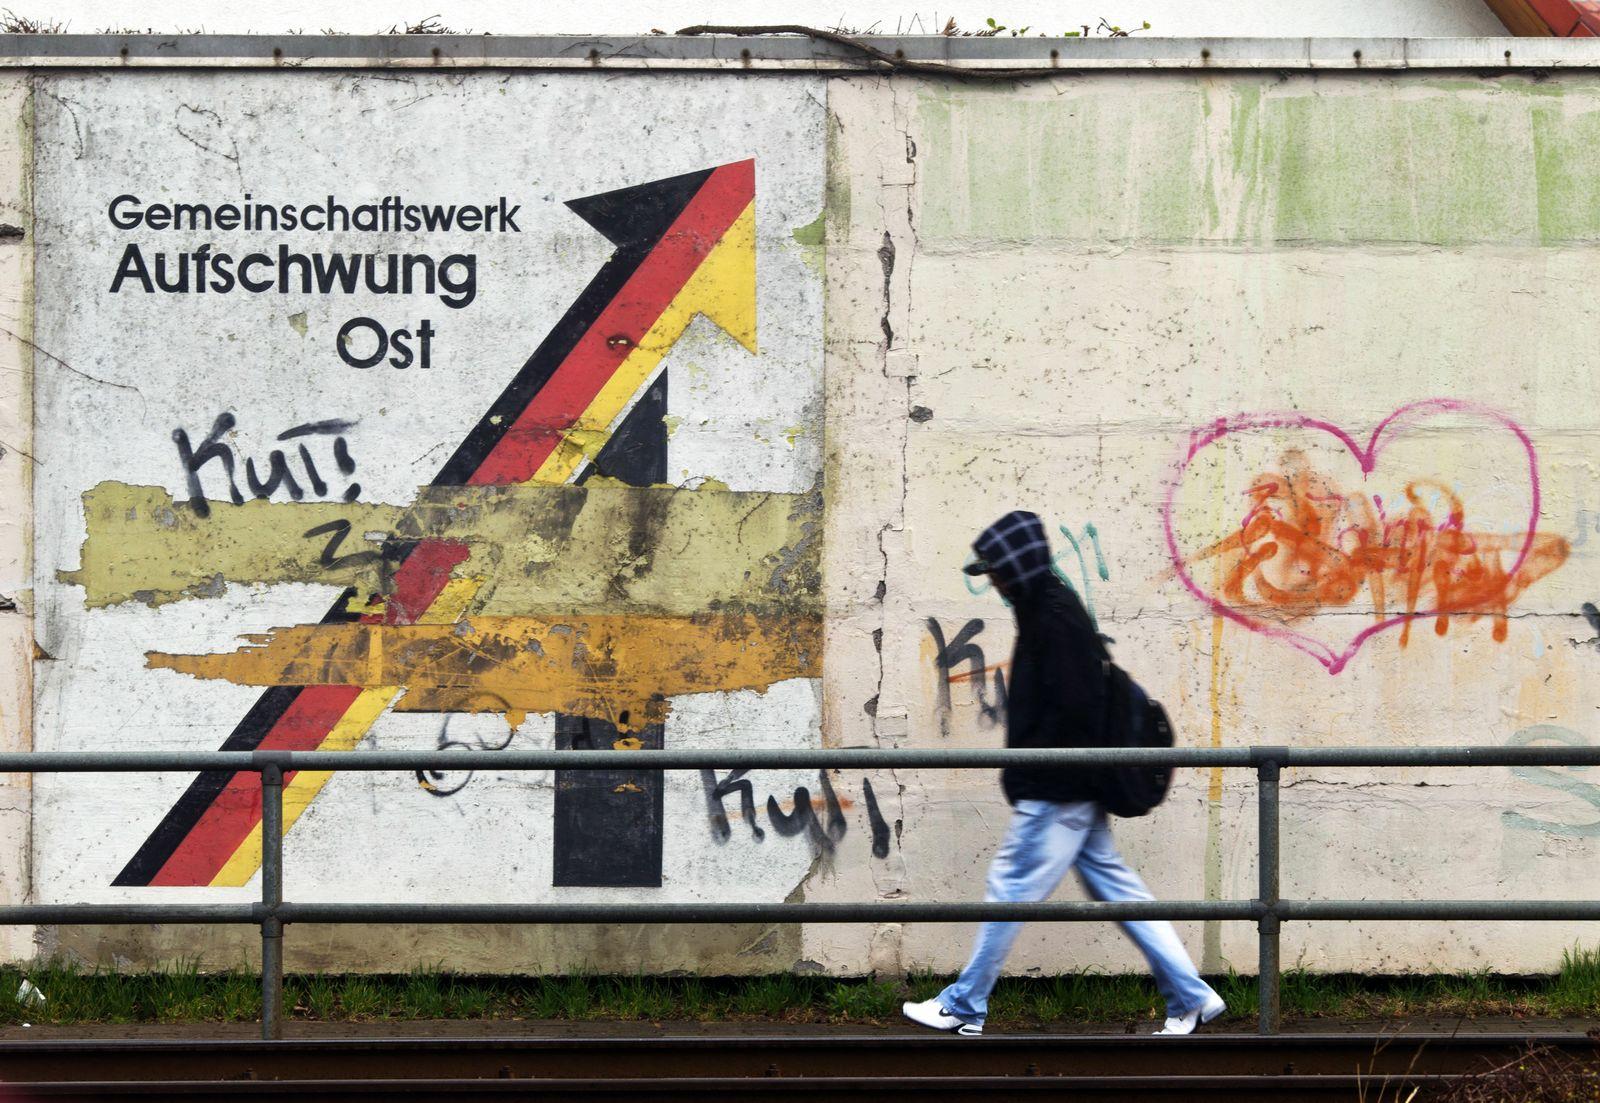 Soli-Zuschlag / Aufbau Ost / Solidaritätszuschlag